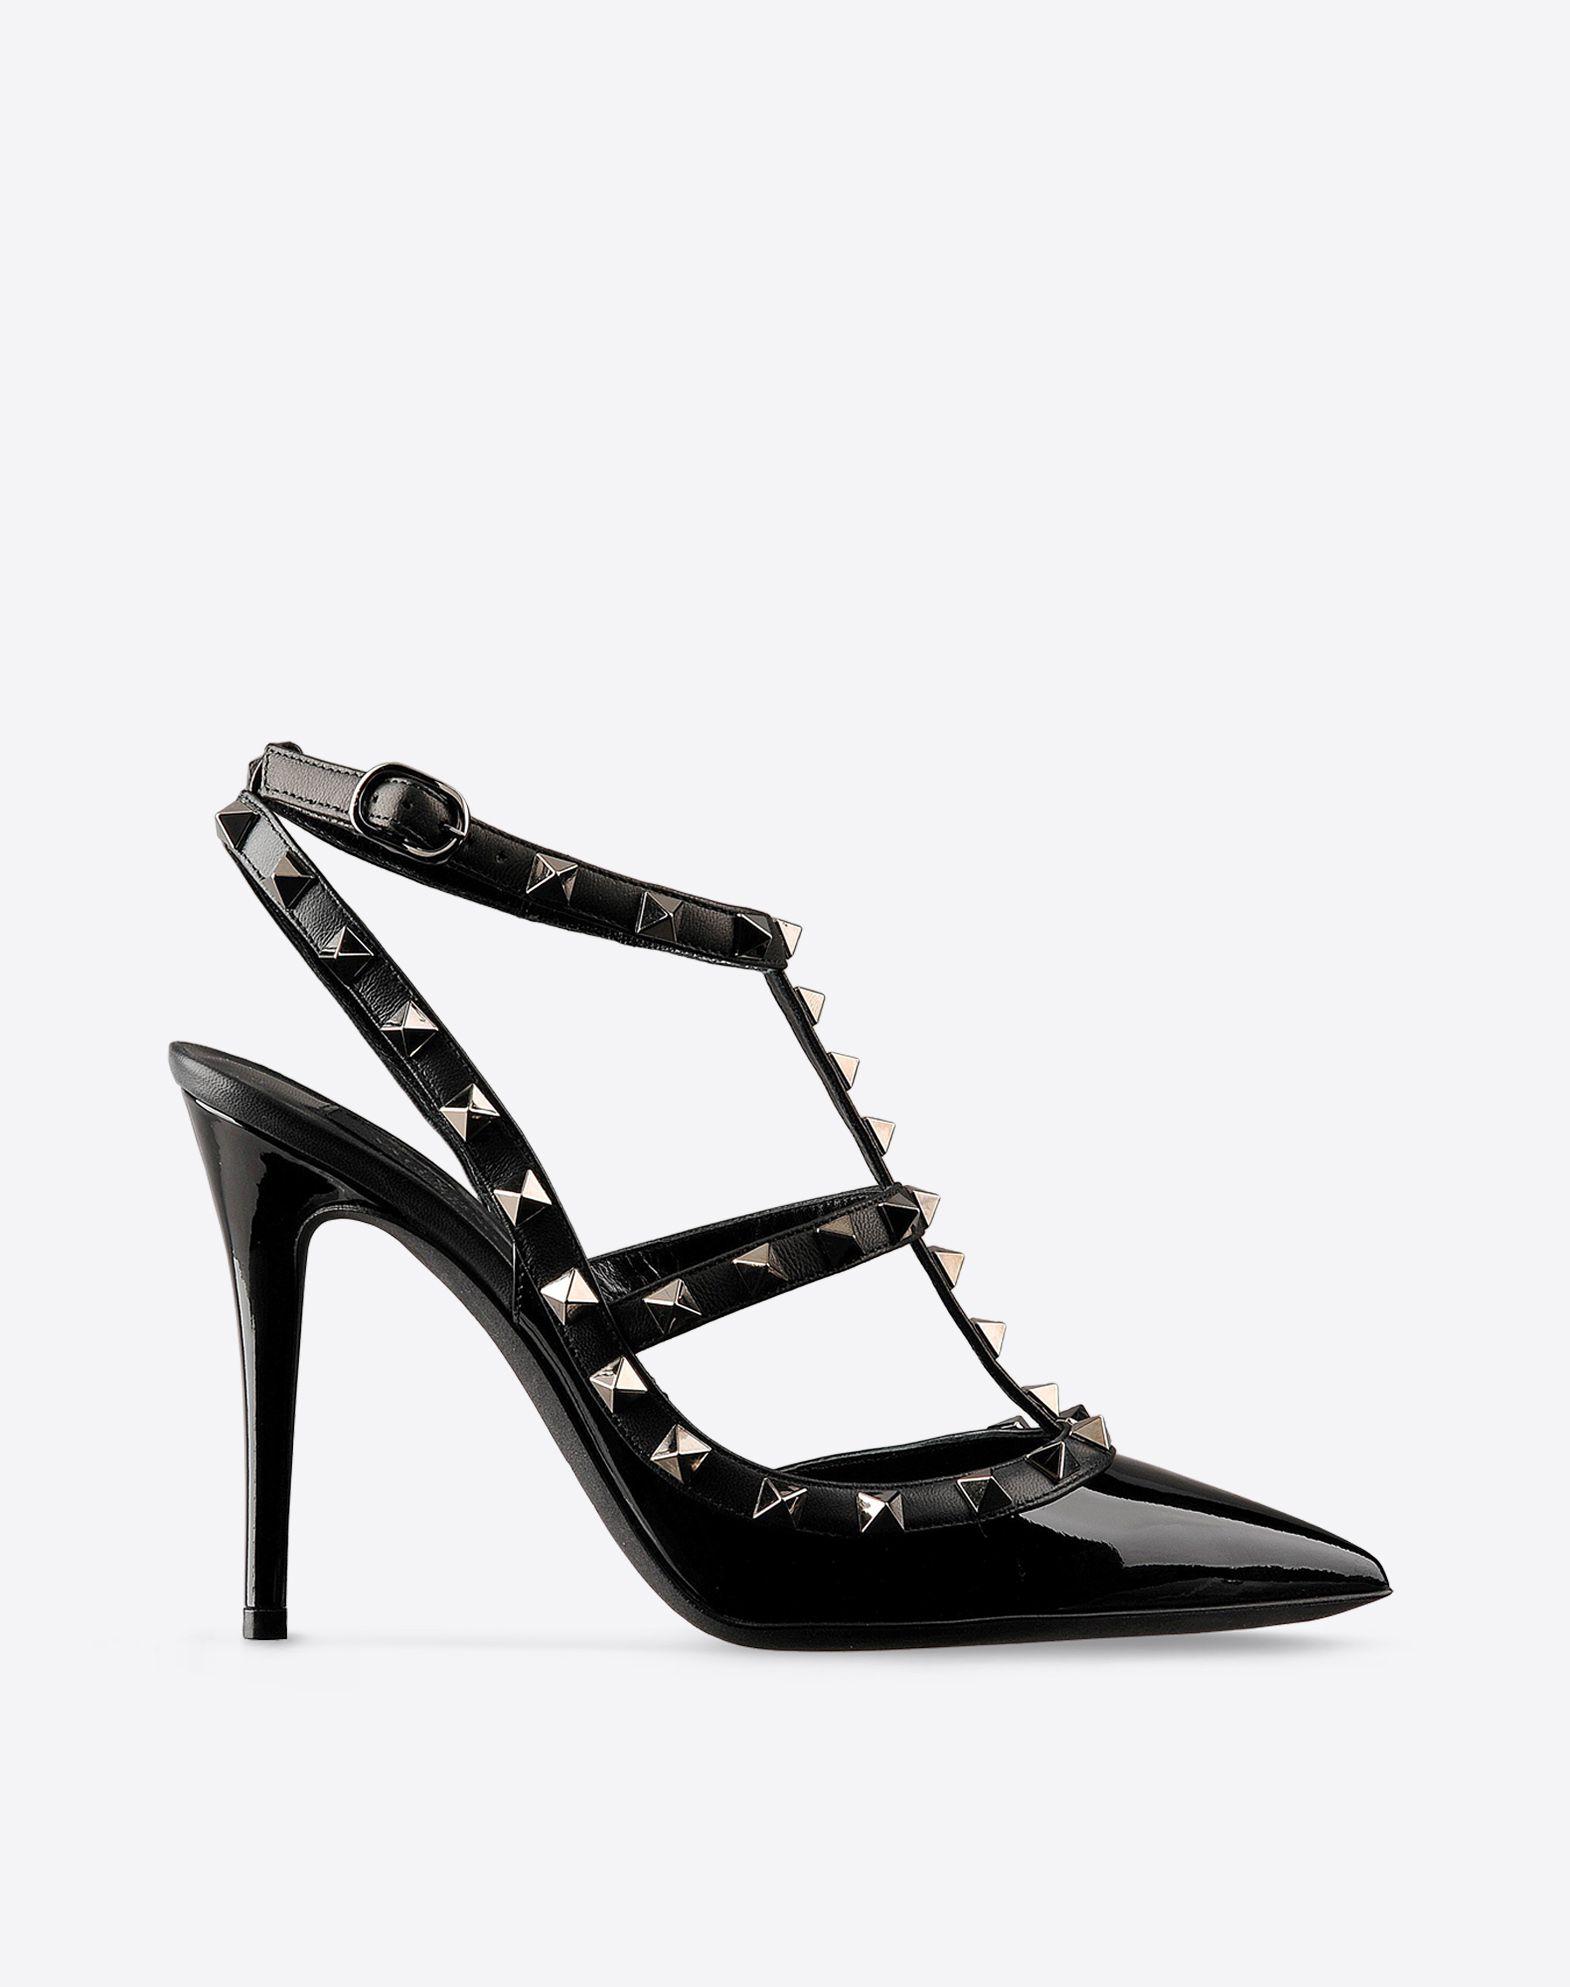 escarpin rockstud noir escarpin femme valentino garavani boutique en ligne valentino. Black Bedroom Furniture Sets. Home Design Ideas